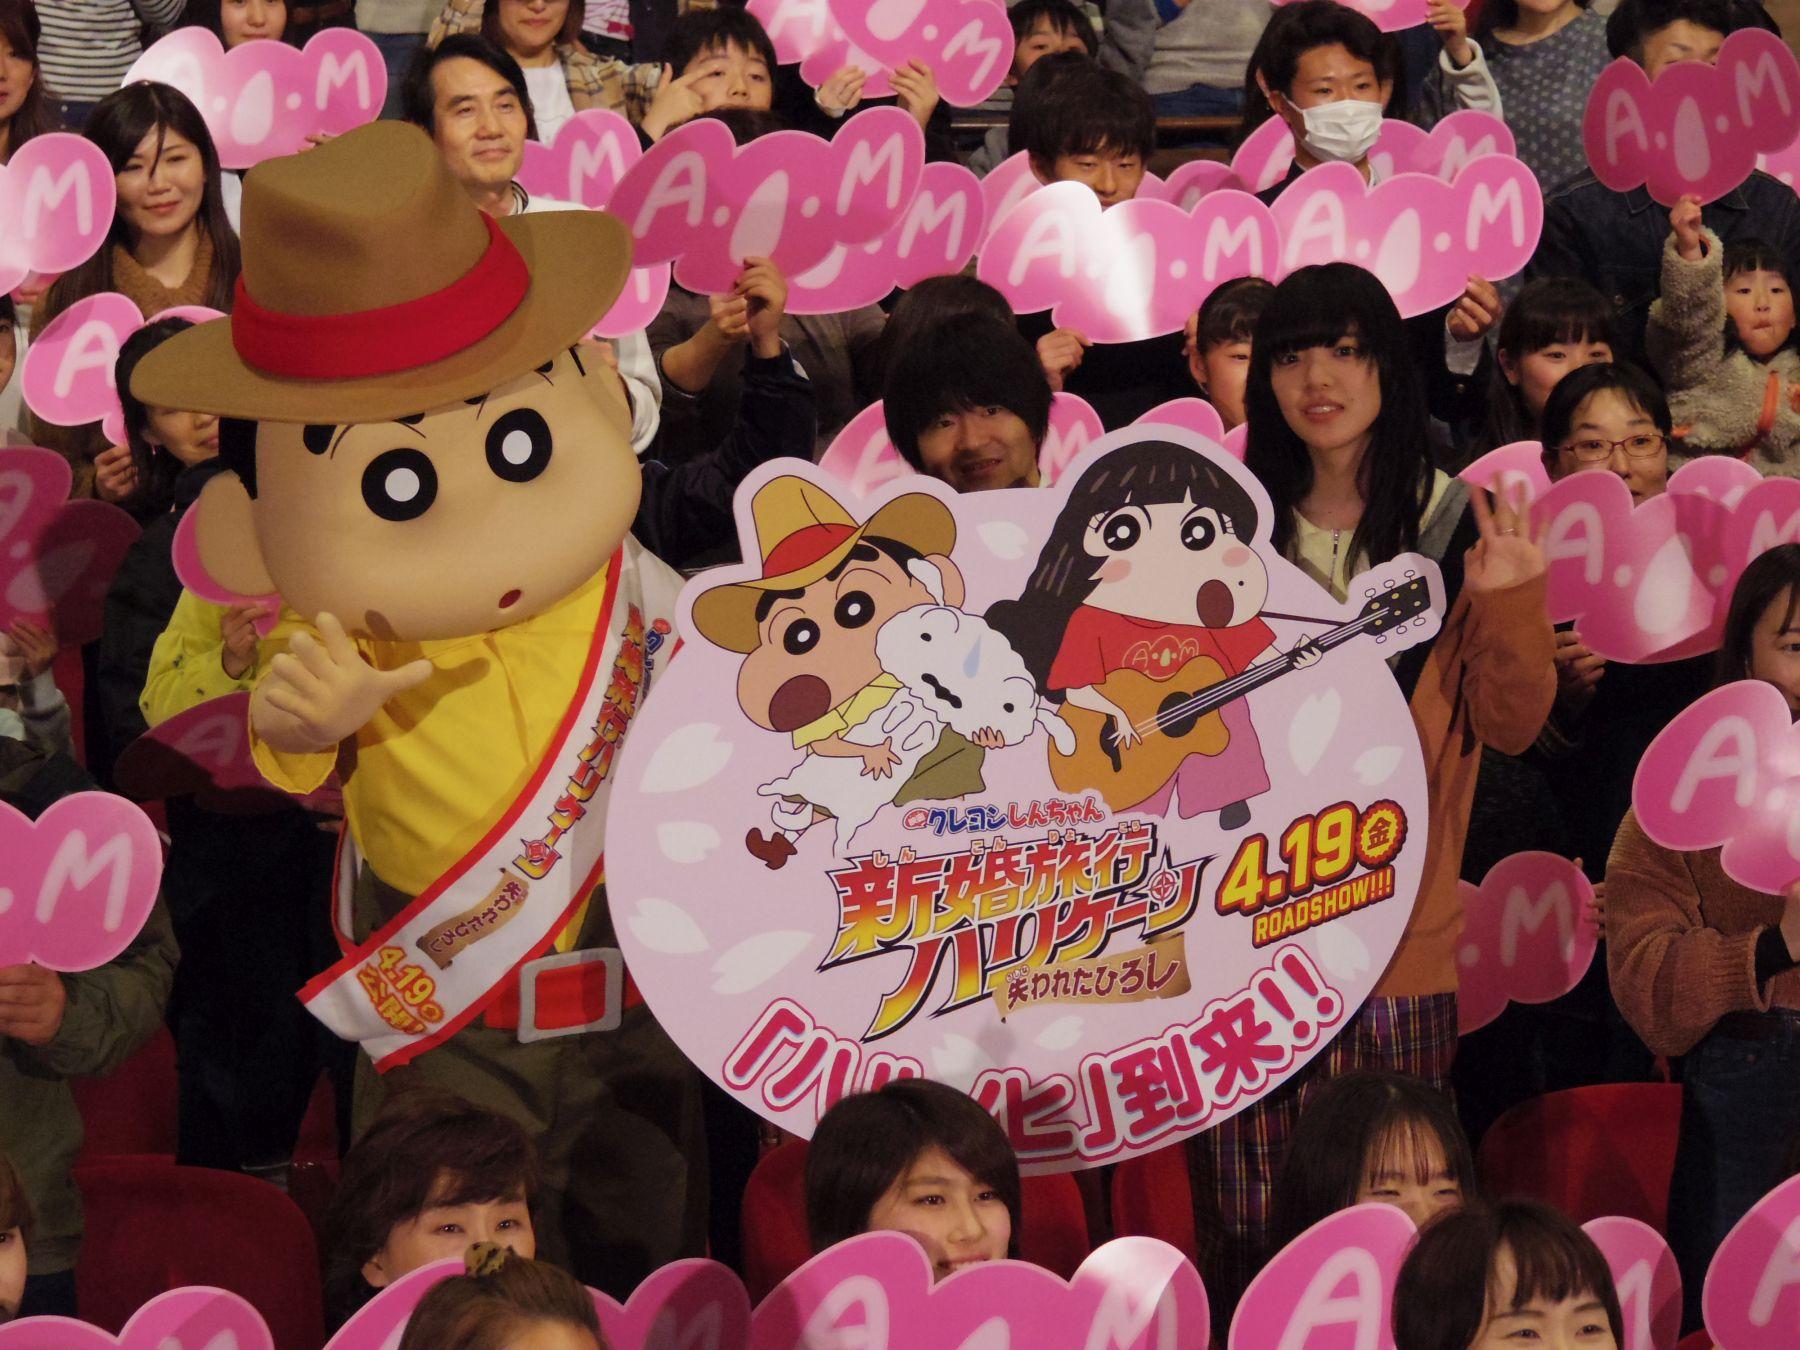 Japan Anime & Manga Market 004